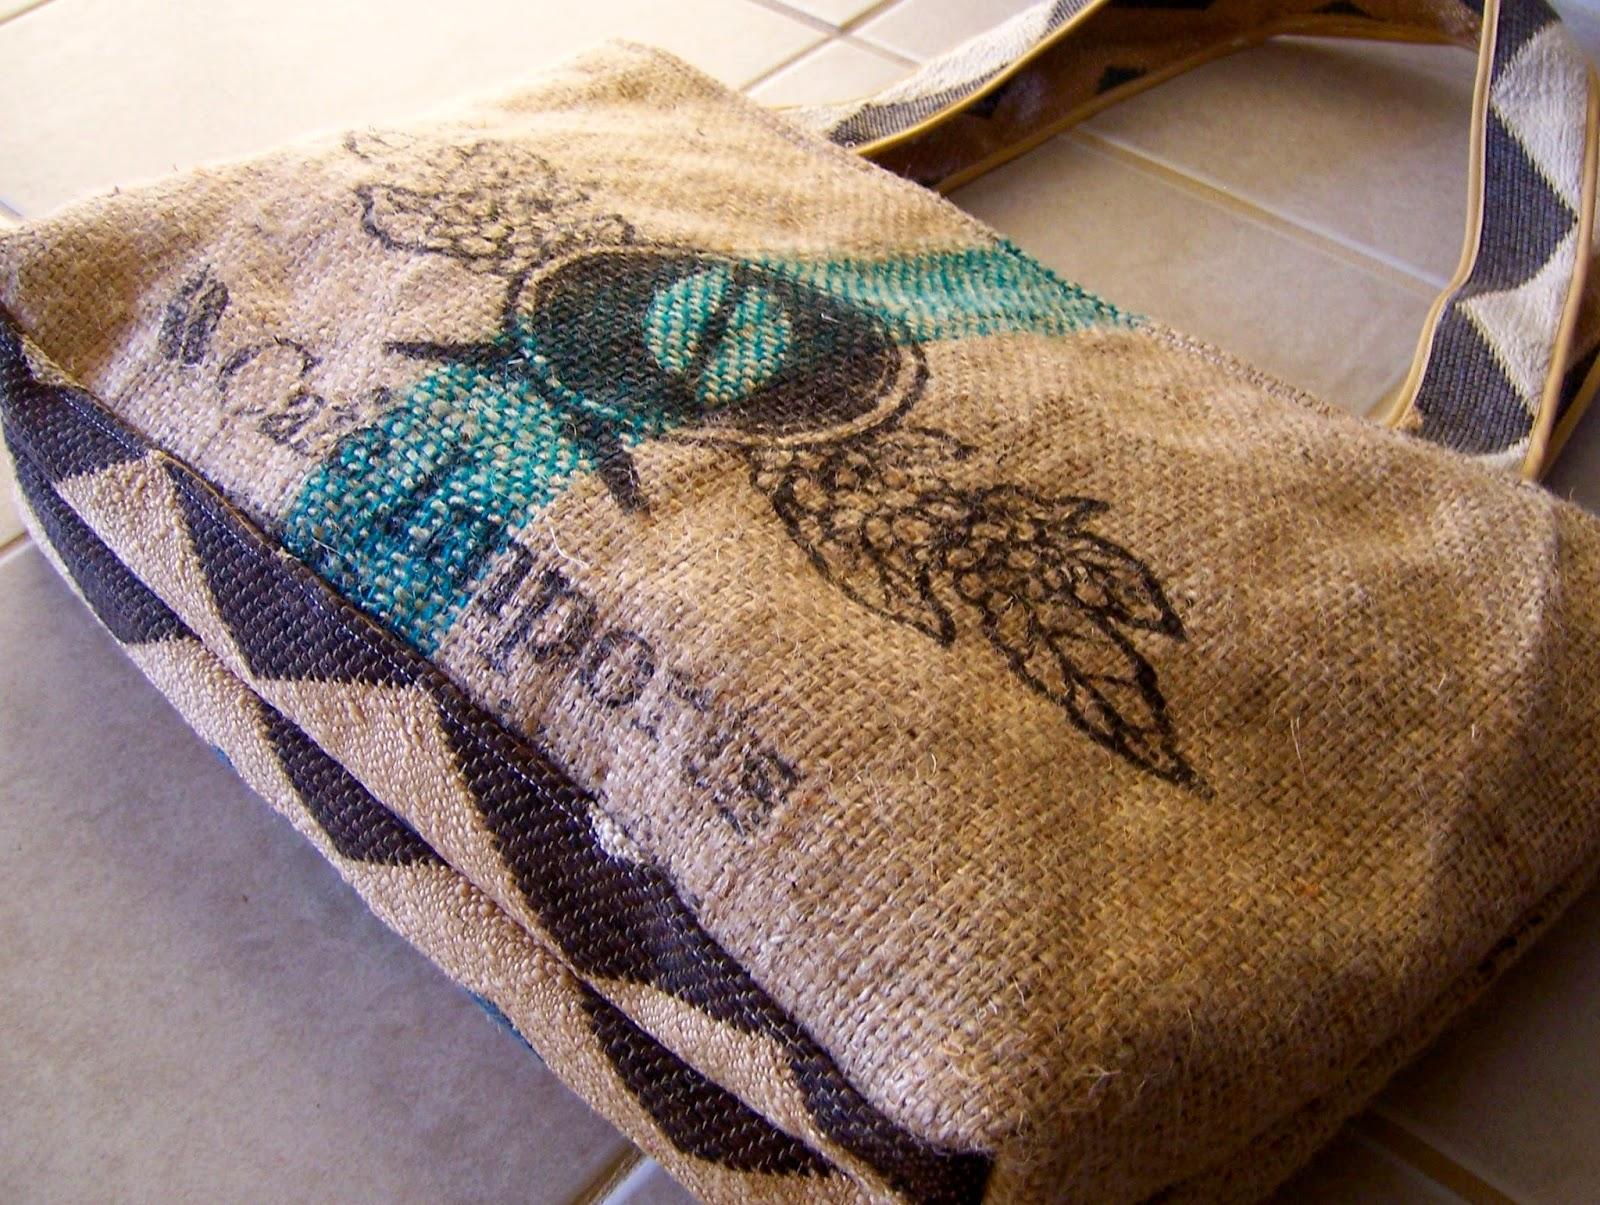 Bean burlap tote bag - Lina and Vi Plymouth MI bottom view